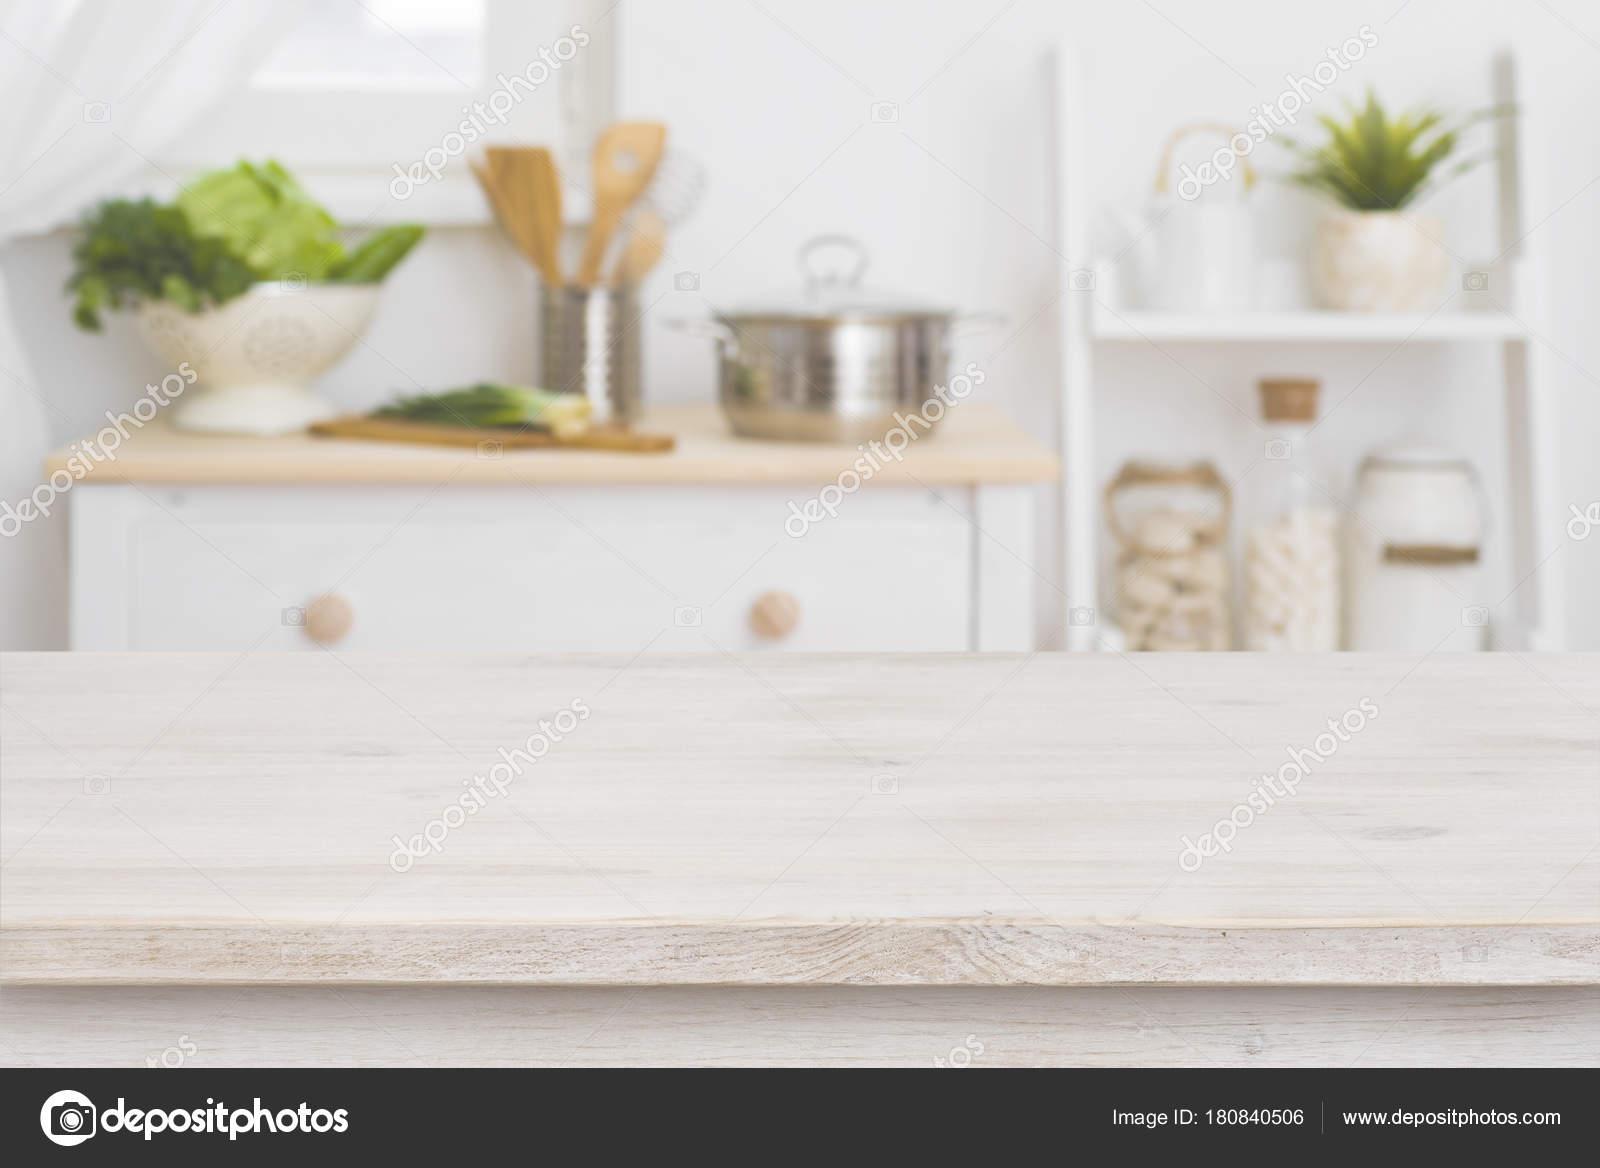 Table Top Defocused Kitchen Interior Background — Stock ...